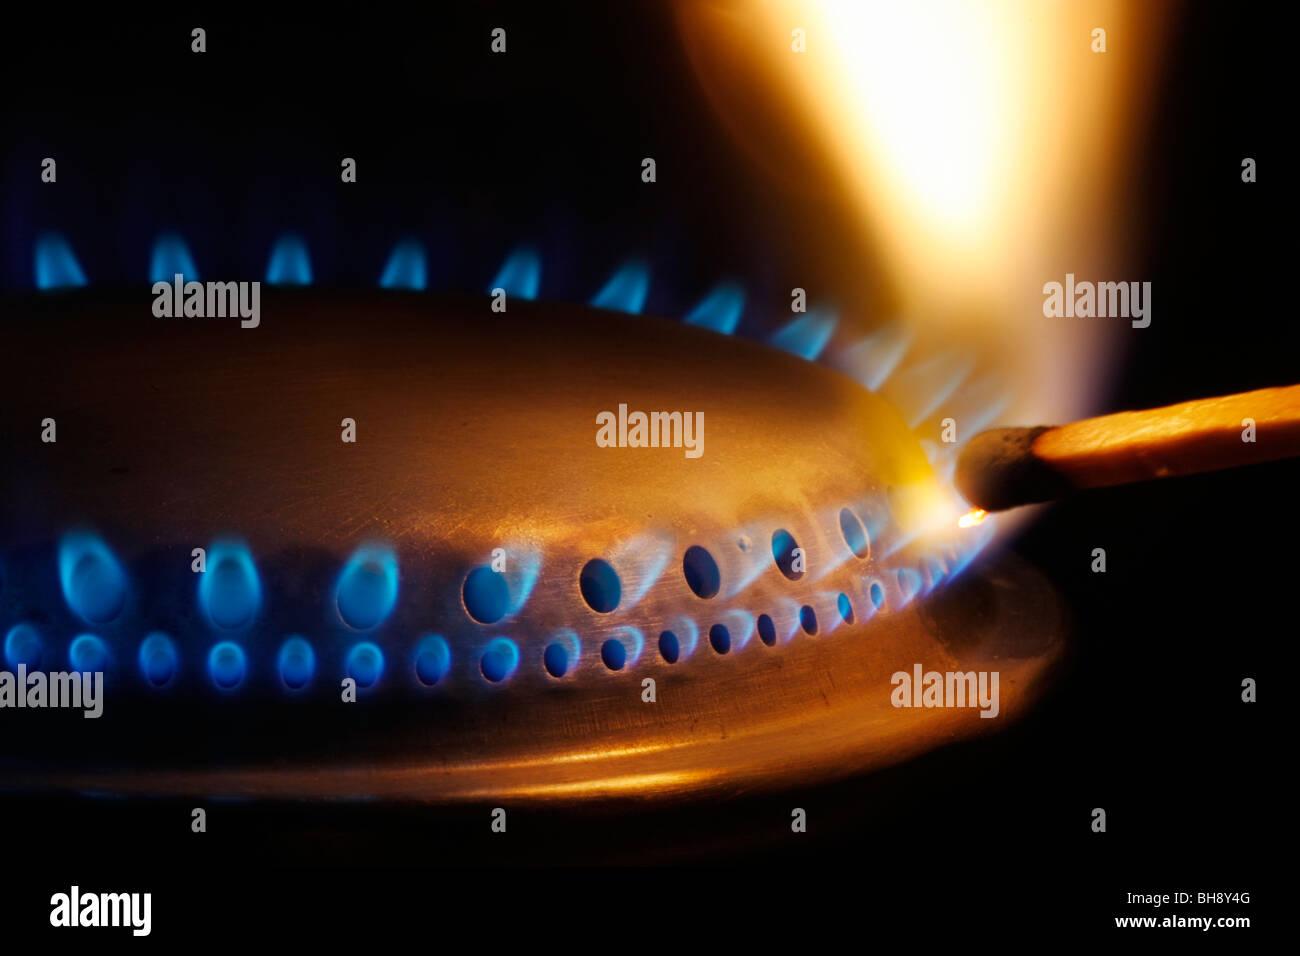 Close-up of a match lightening a gas burner - Stock Image